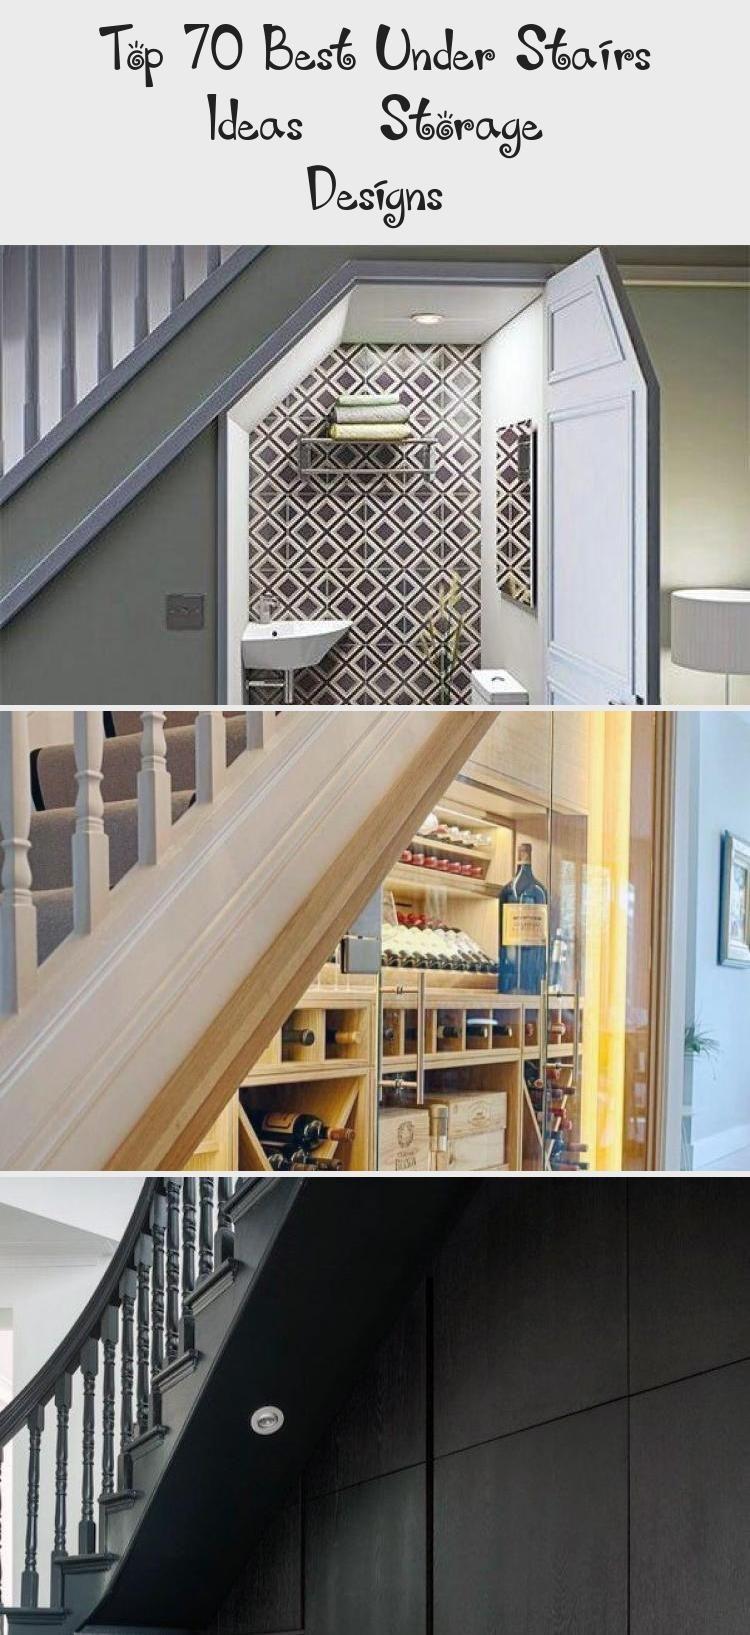 pull out cabinet for kitchen storage ideas for under stairs interior kitchenstoragerack on kitchen under stairs id=63534